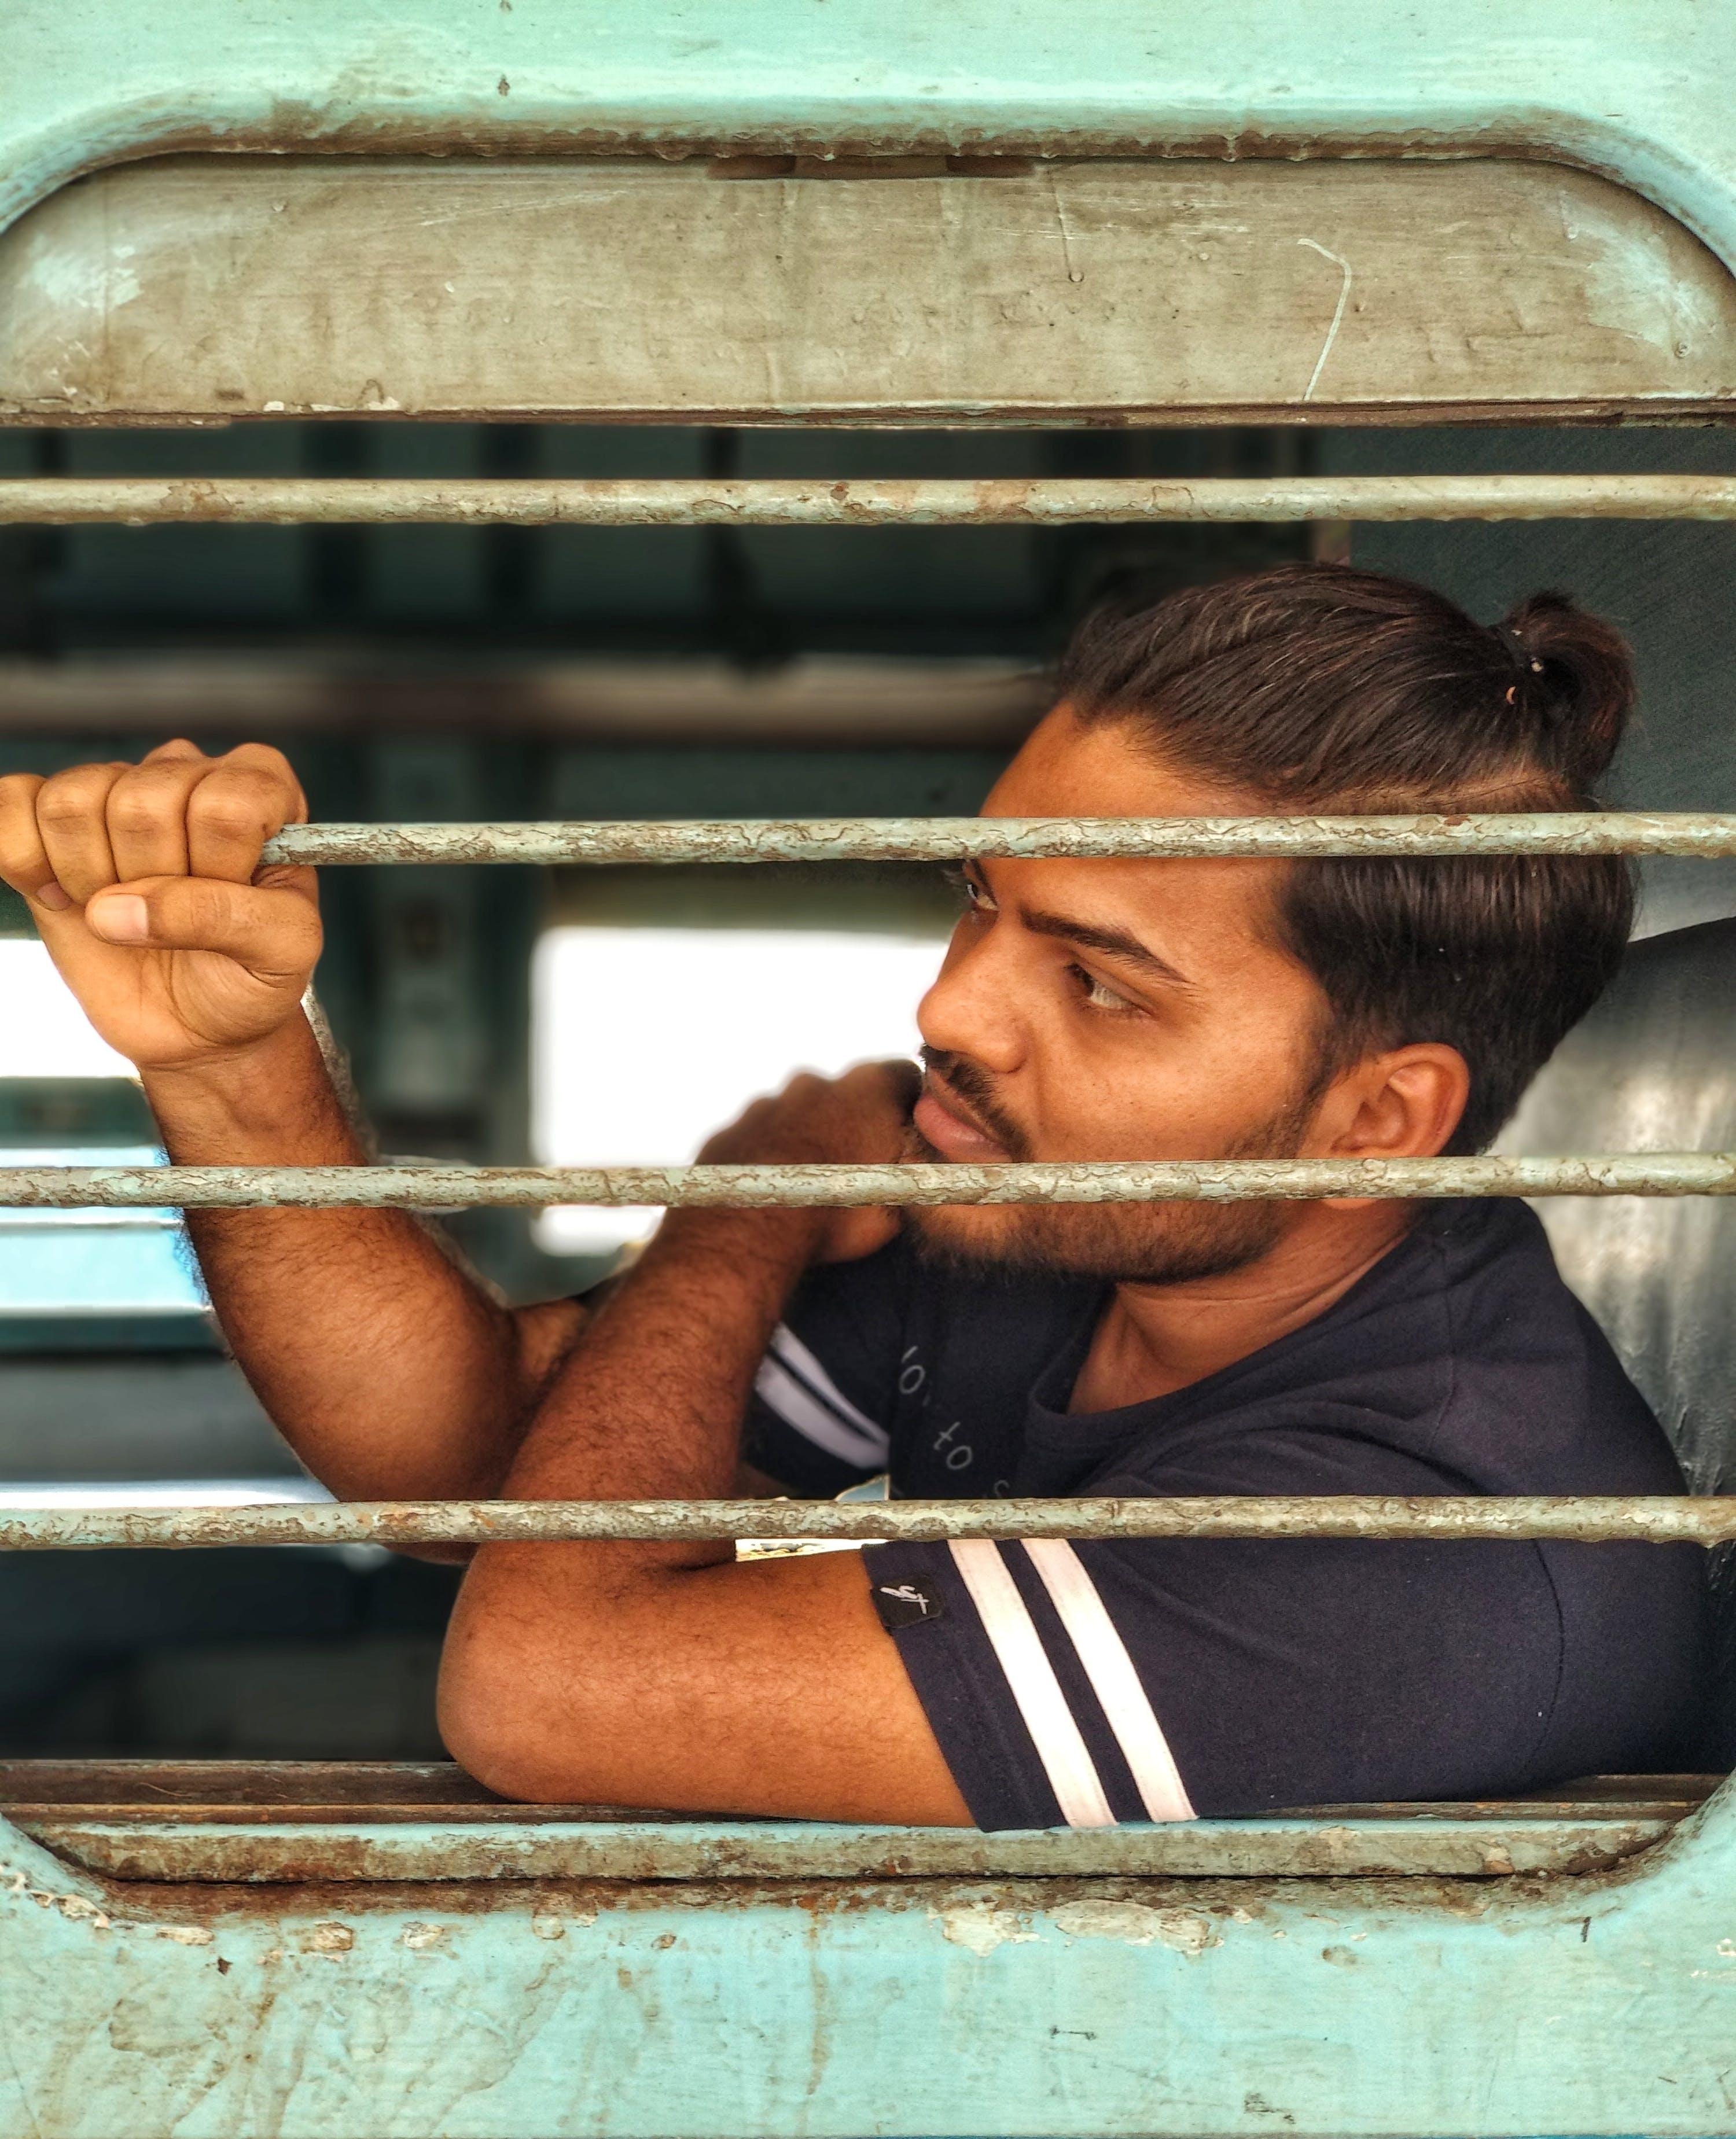 Man Wearing Black Crew-neck T-shirt Inside Green Vehicle